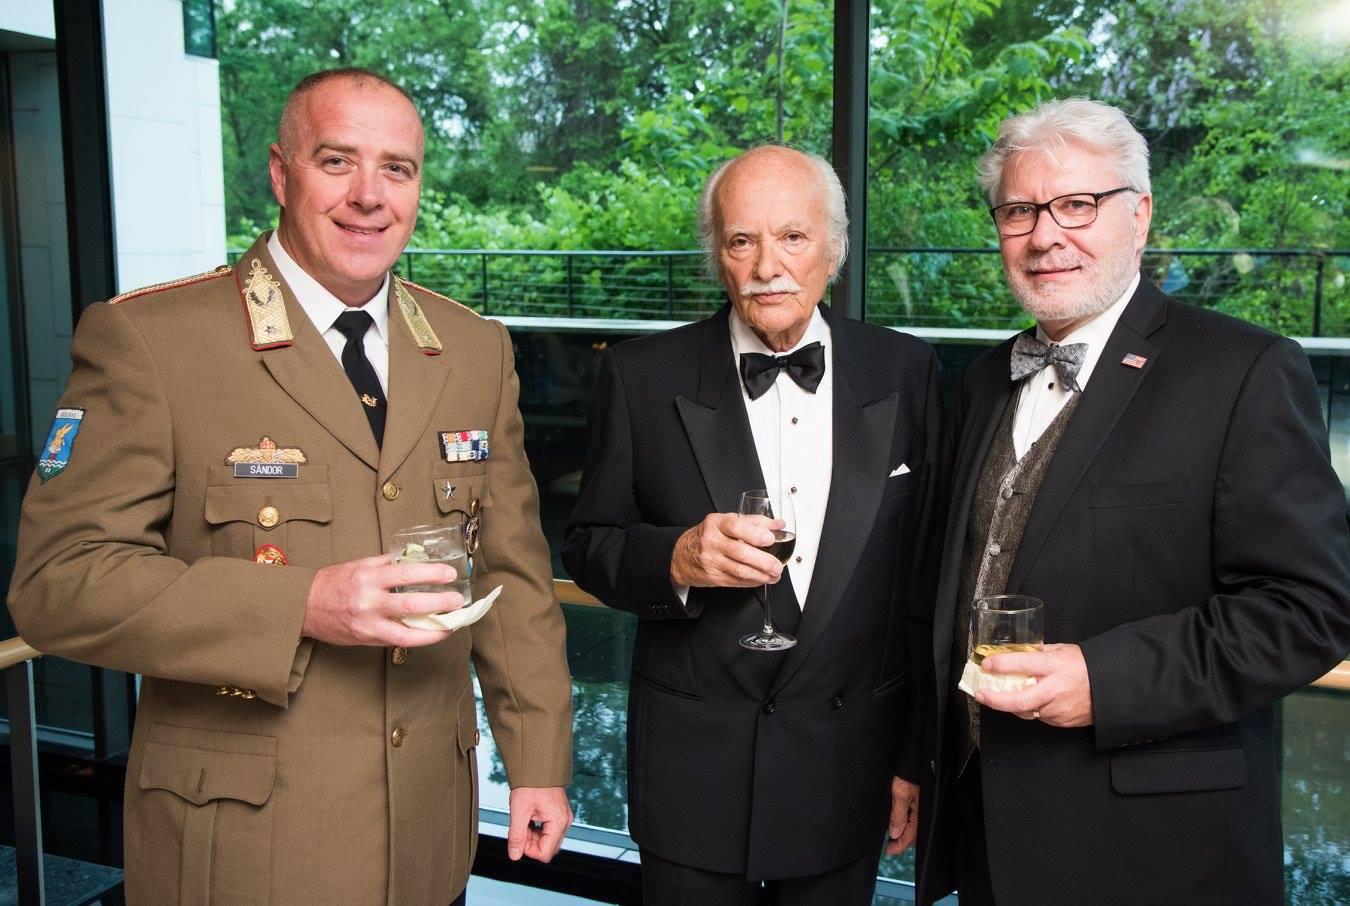 Brigadier General Zsolt Sándor, Mr. Istvan Teleki, Mr. Stefan Fedor